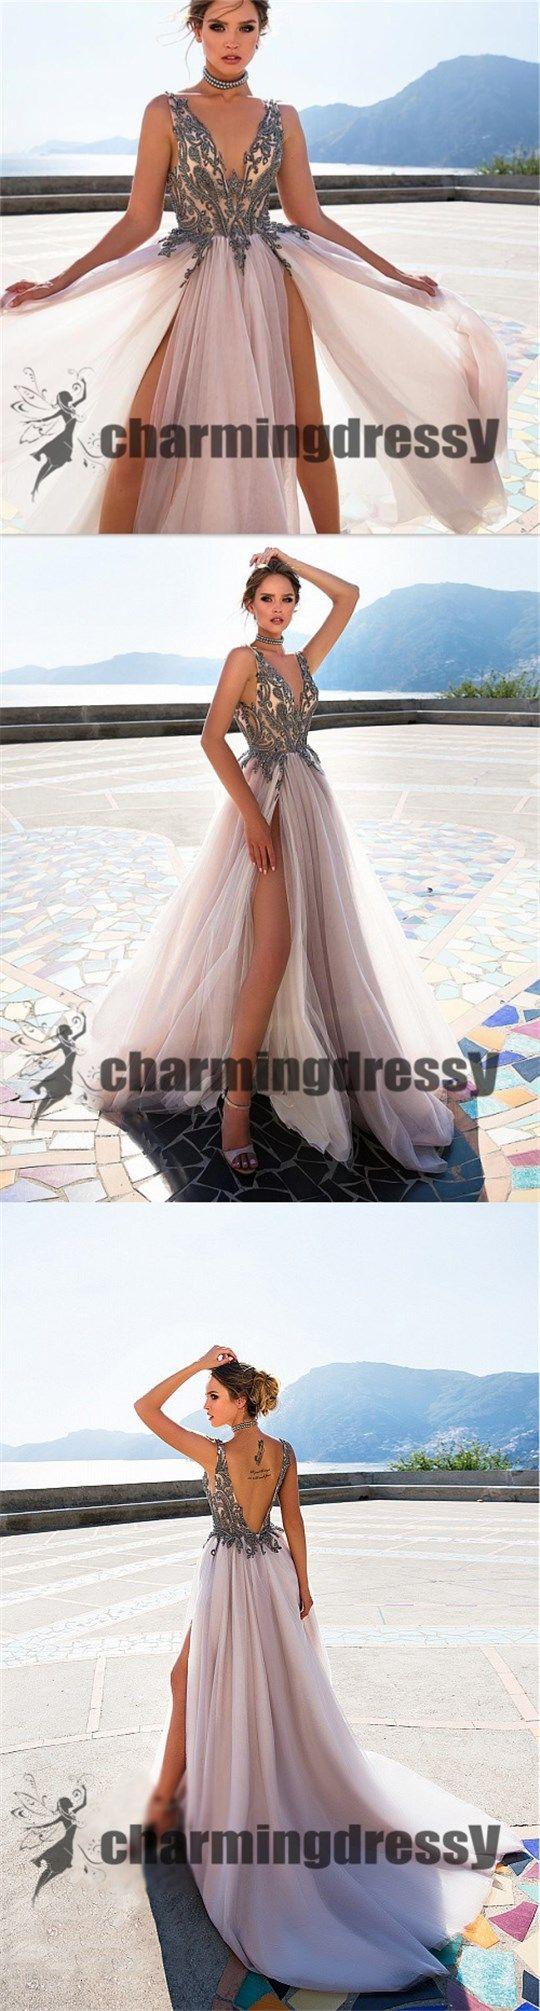 Deep V-Neck Tulle Split Fashion Best Sale Long Prom Dresses, Party Dress Online, PD0368  #charmingdressy#promdresses